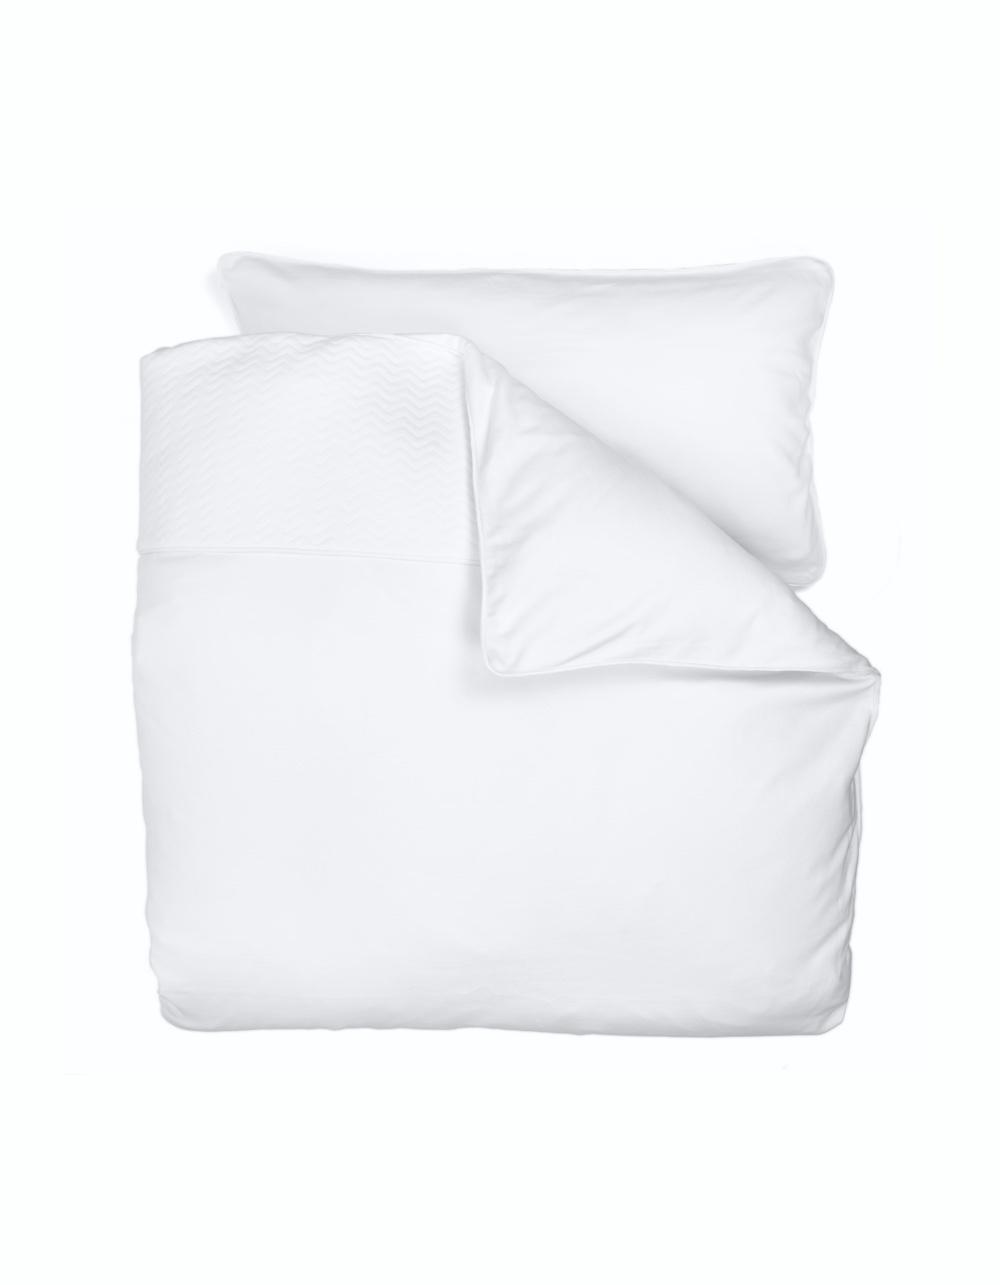 Duvet Cover (100x135cm)  & Pillow case Chevron White-1